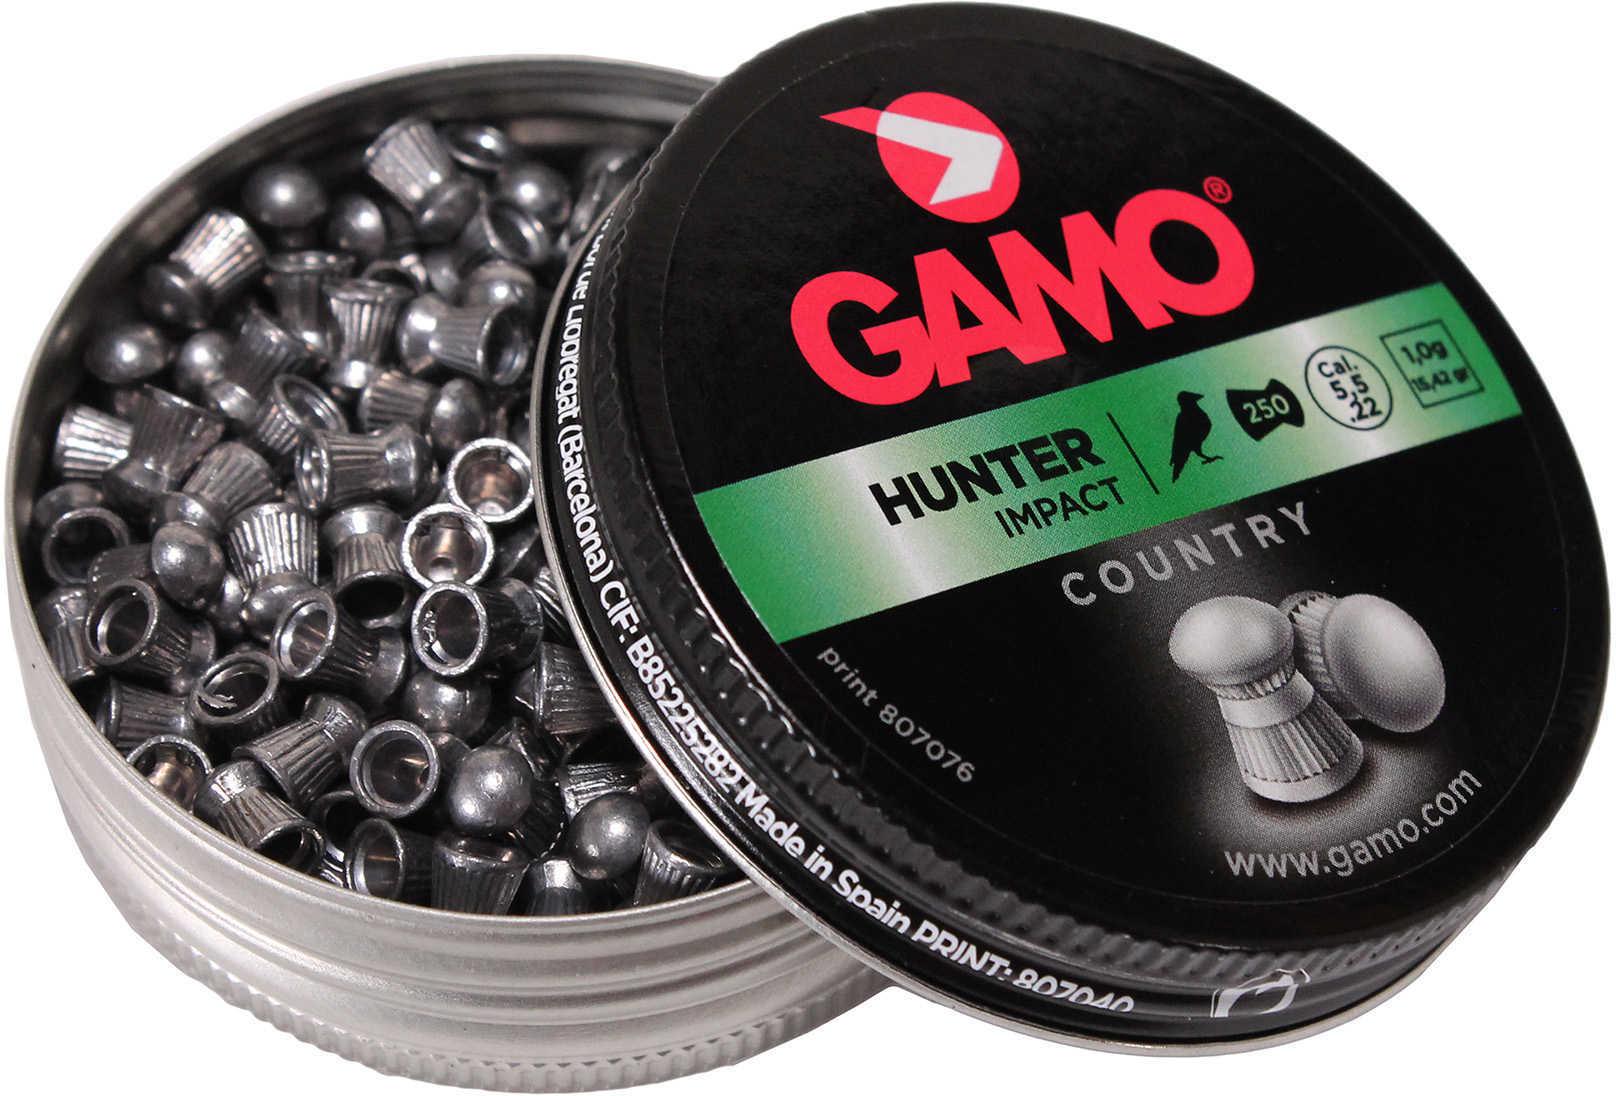 Gamo Hunter Pellets Round Nose .22 Caliber Md: 632052554